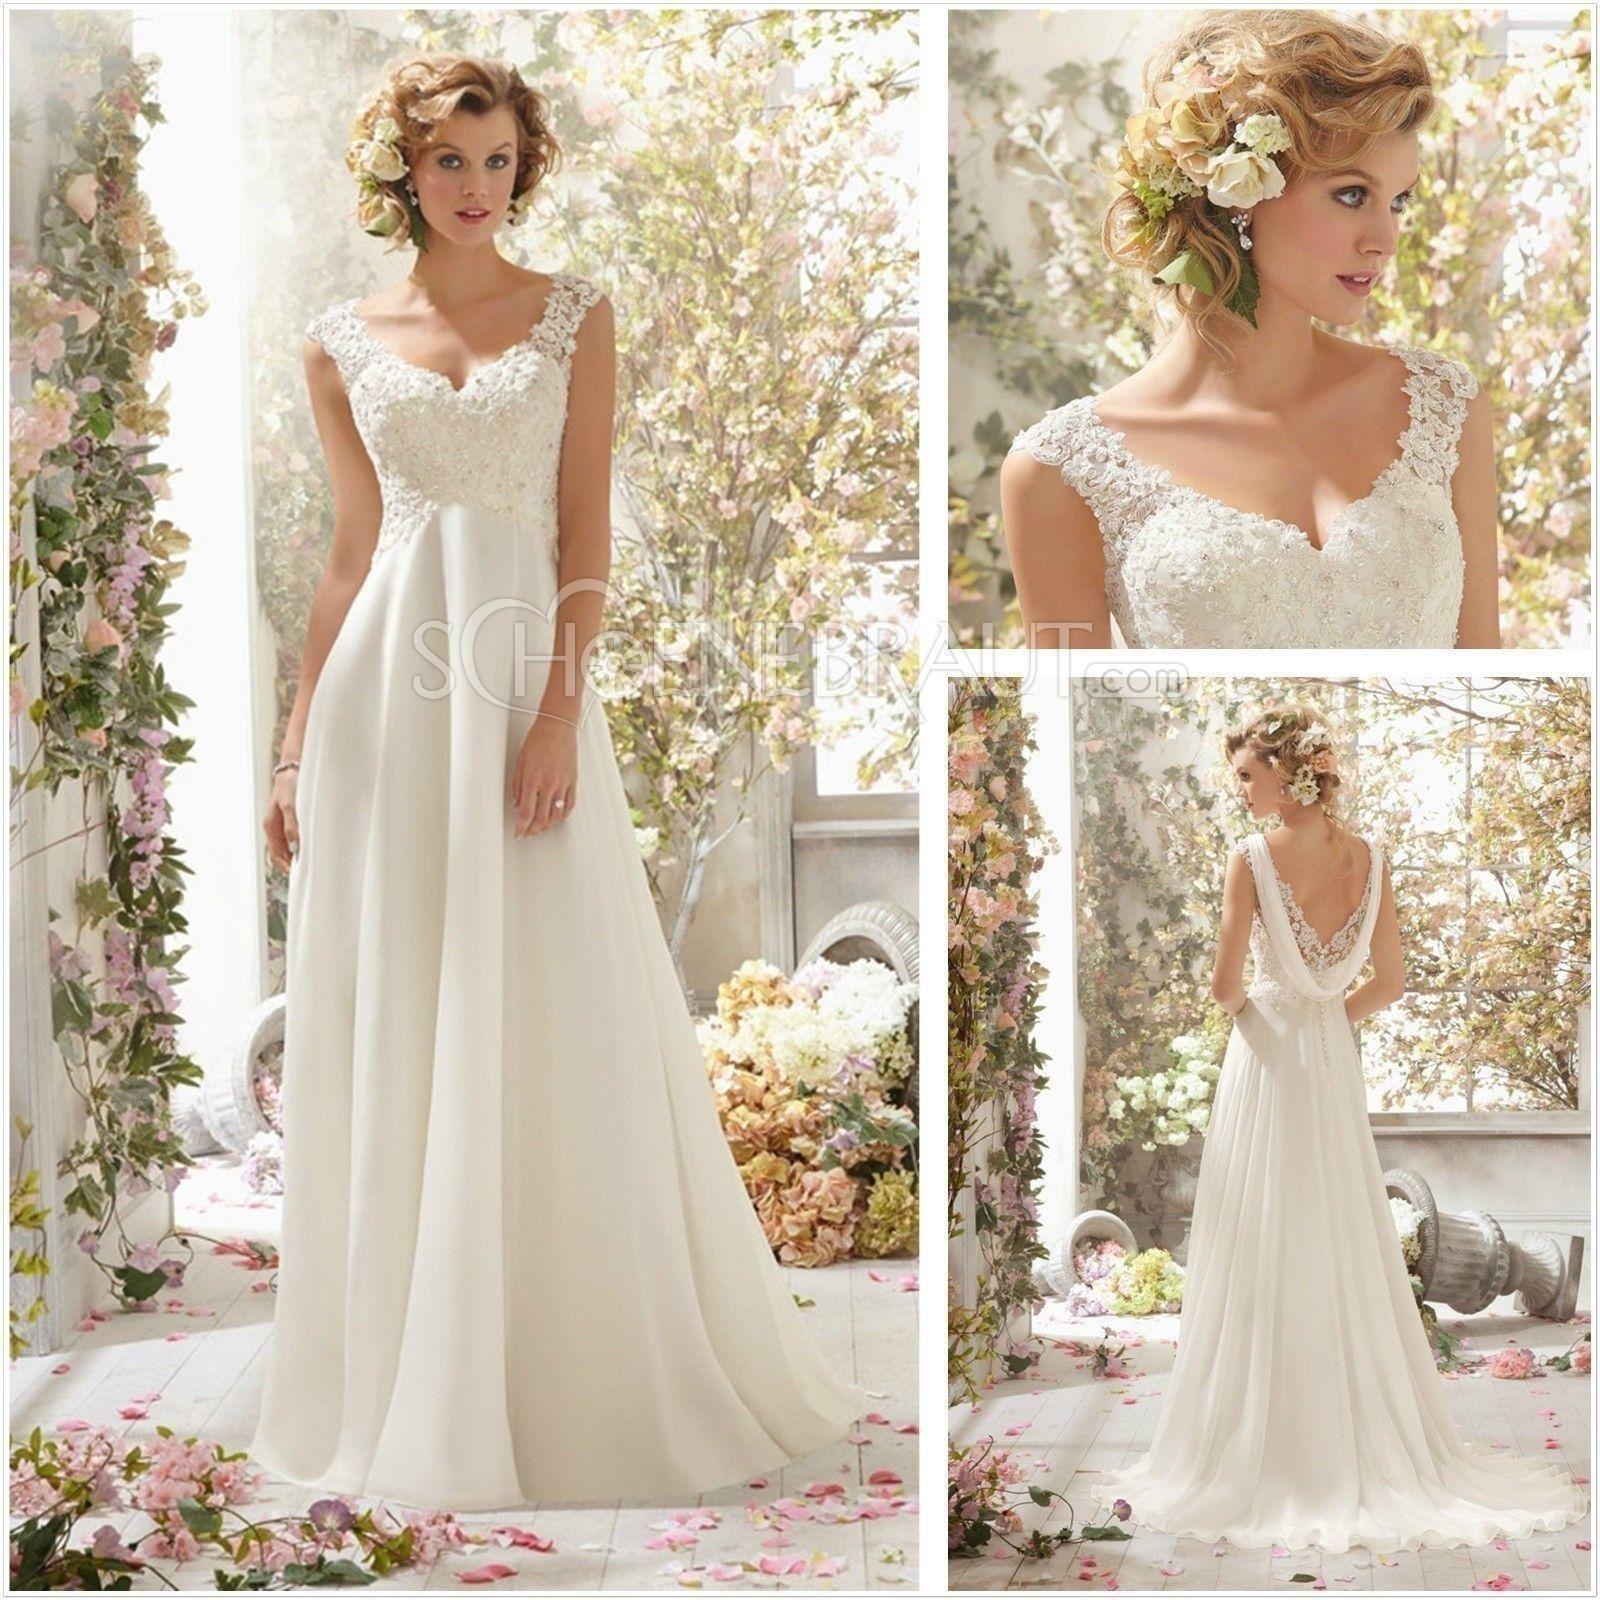 Designer Luxus Kleid Lang Mit Spitze StylishAbend Einfach Kleid Lang Mit Spitze Vertrieb